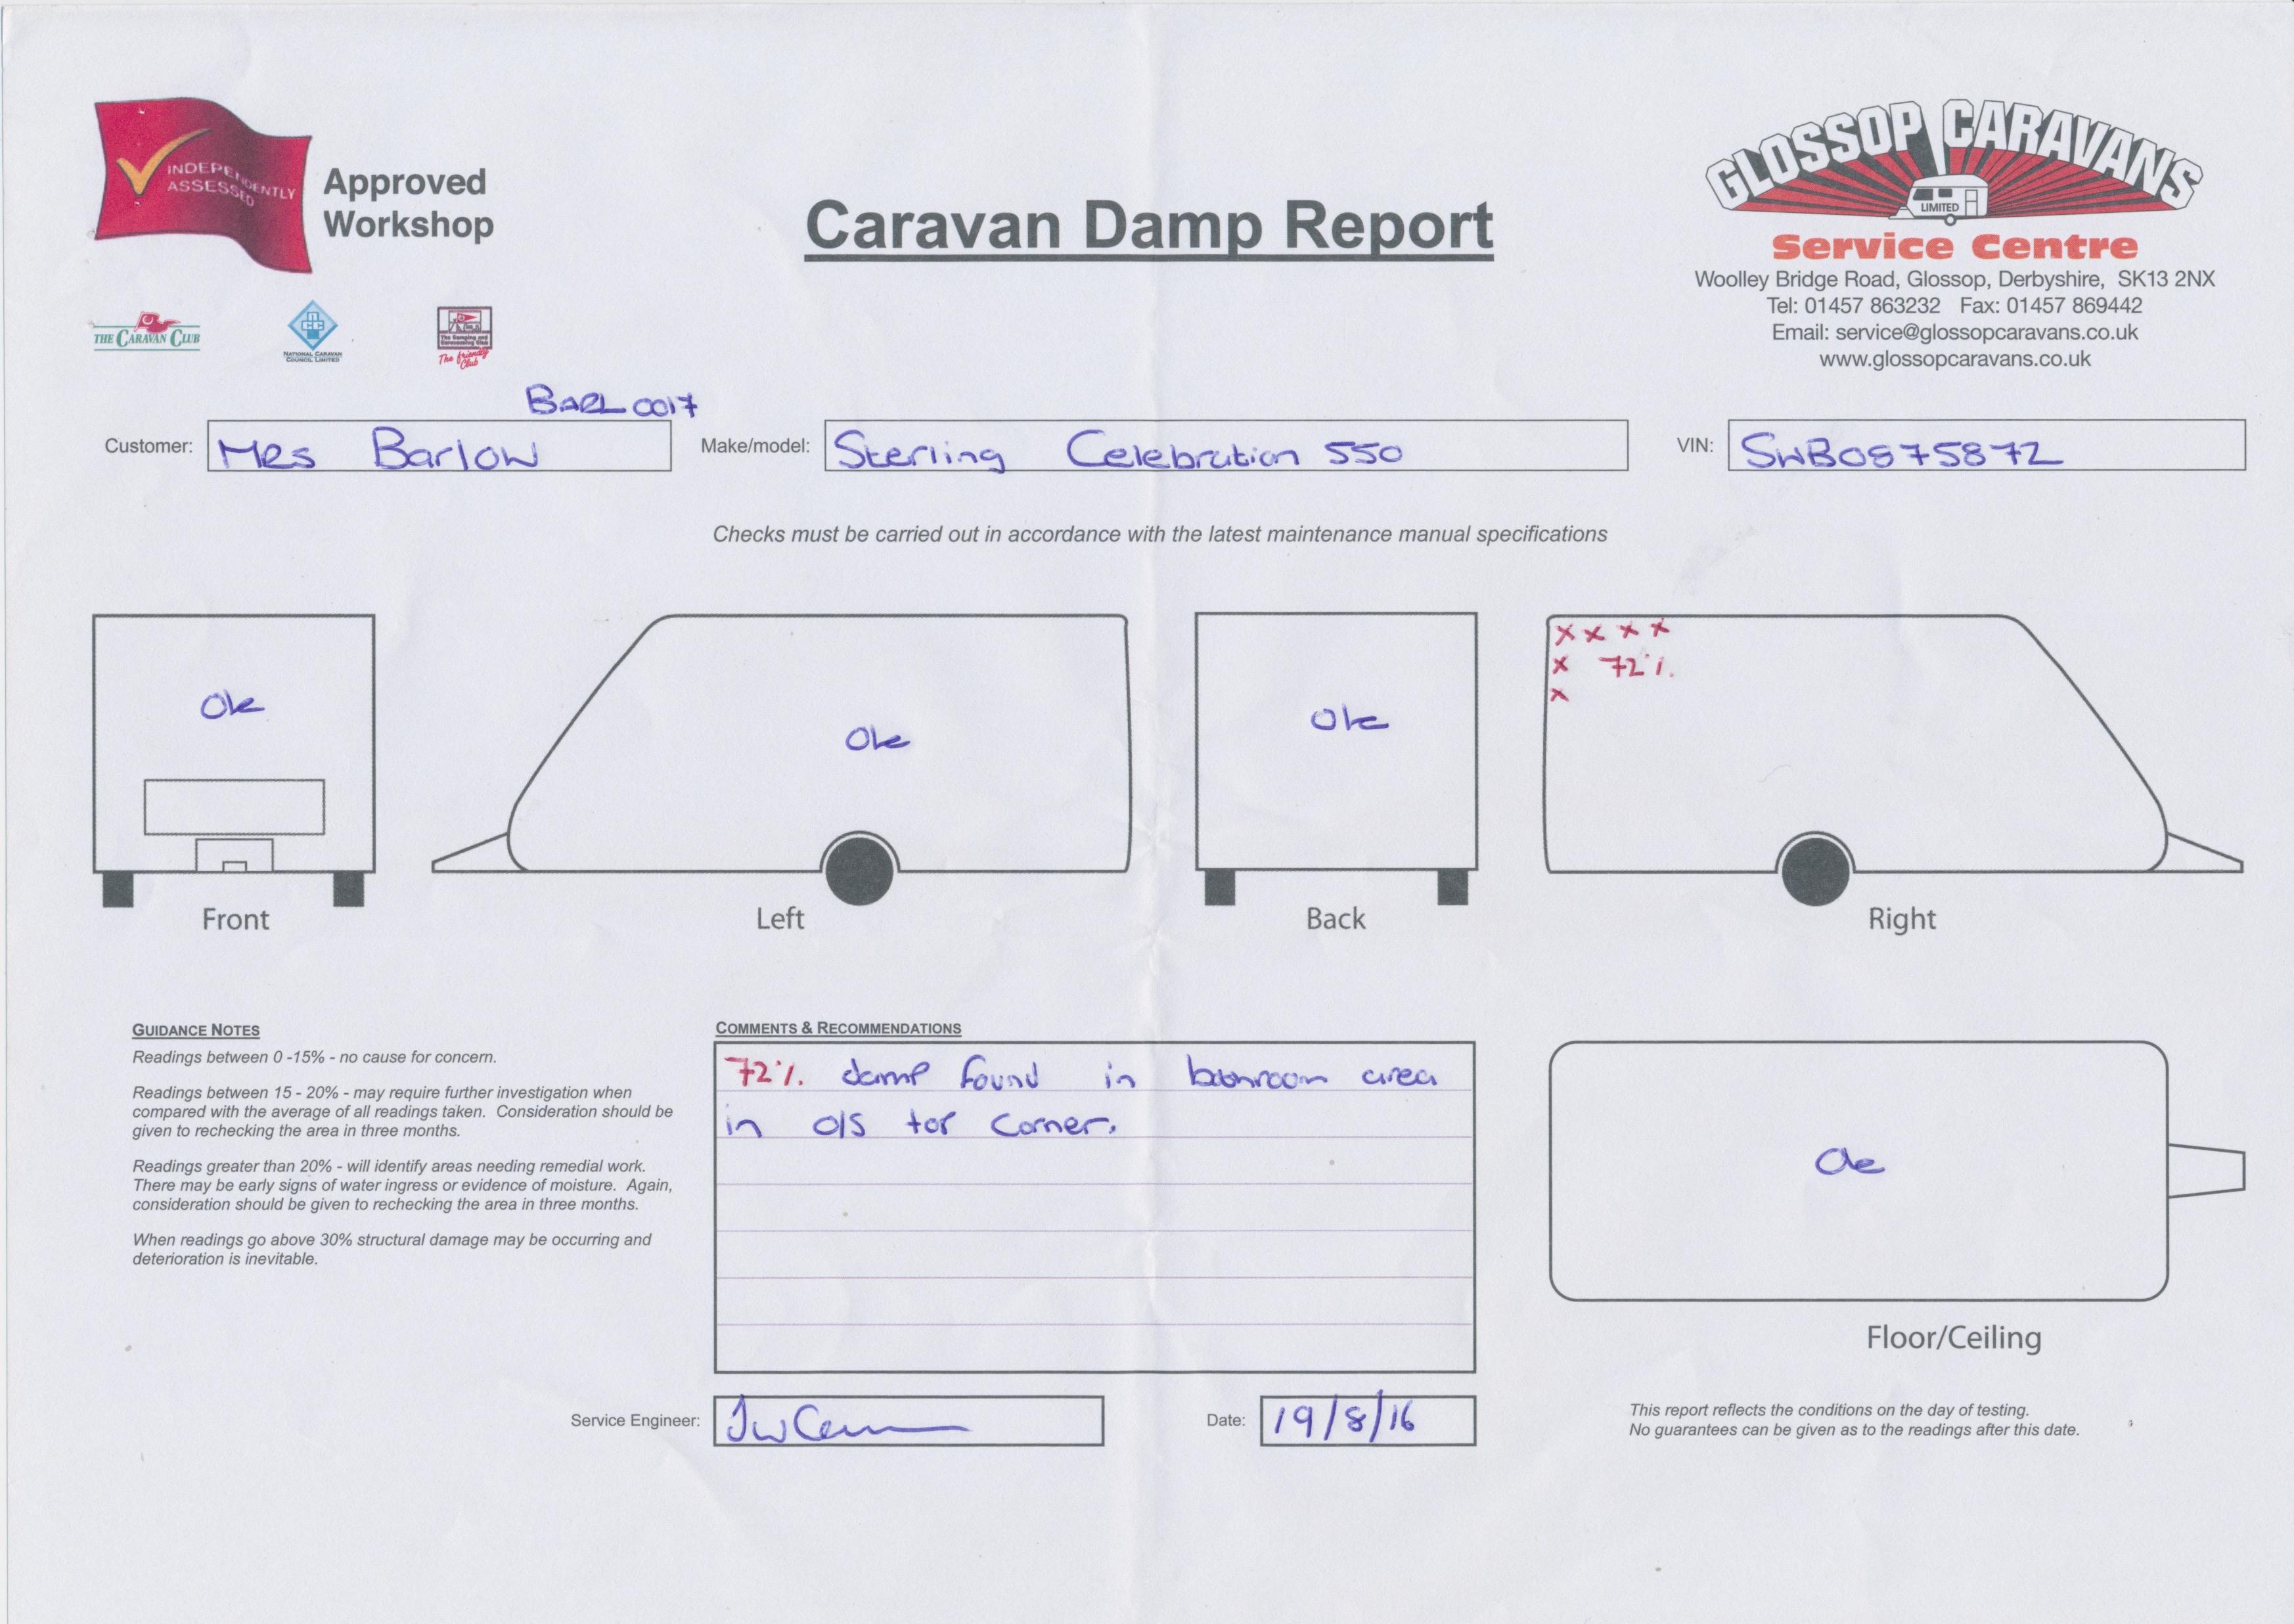 Elddis Caravan Wiring Diagram Electrical Diagrams Sterling Schematic Solar Pv System Buccaneer Enthusiast